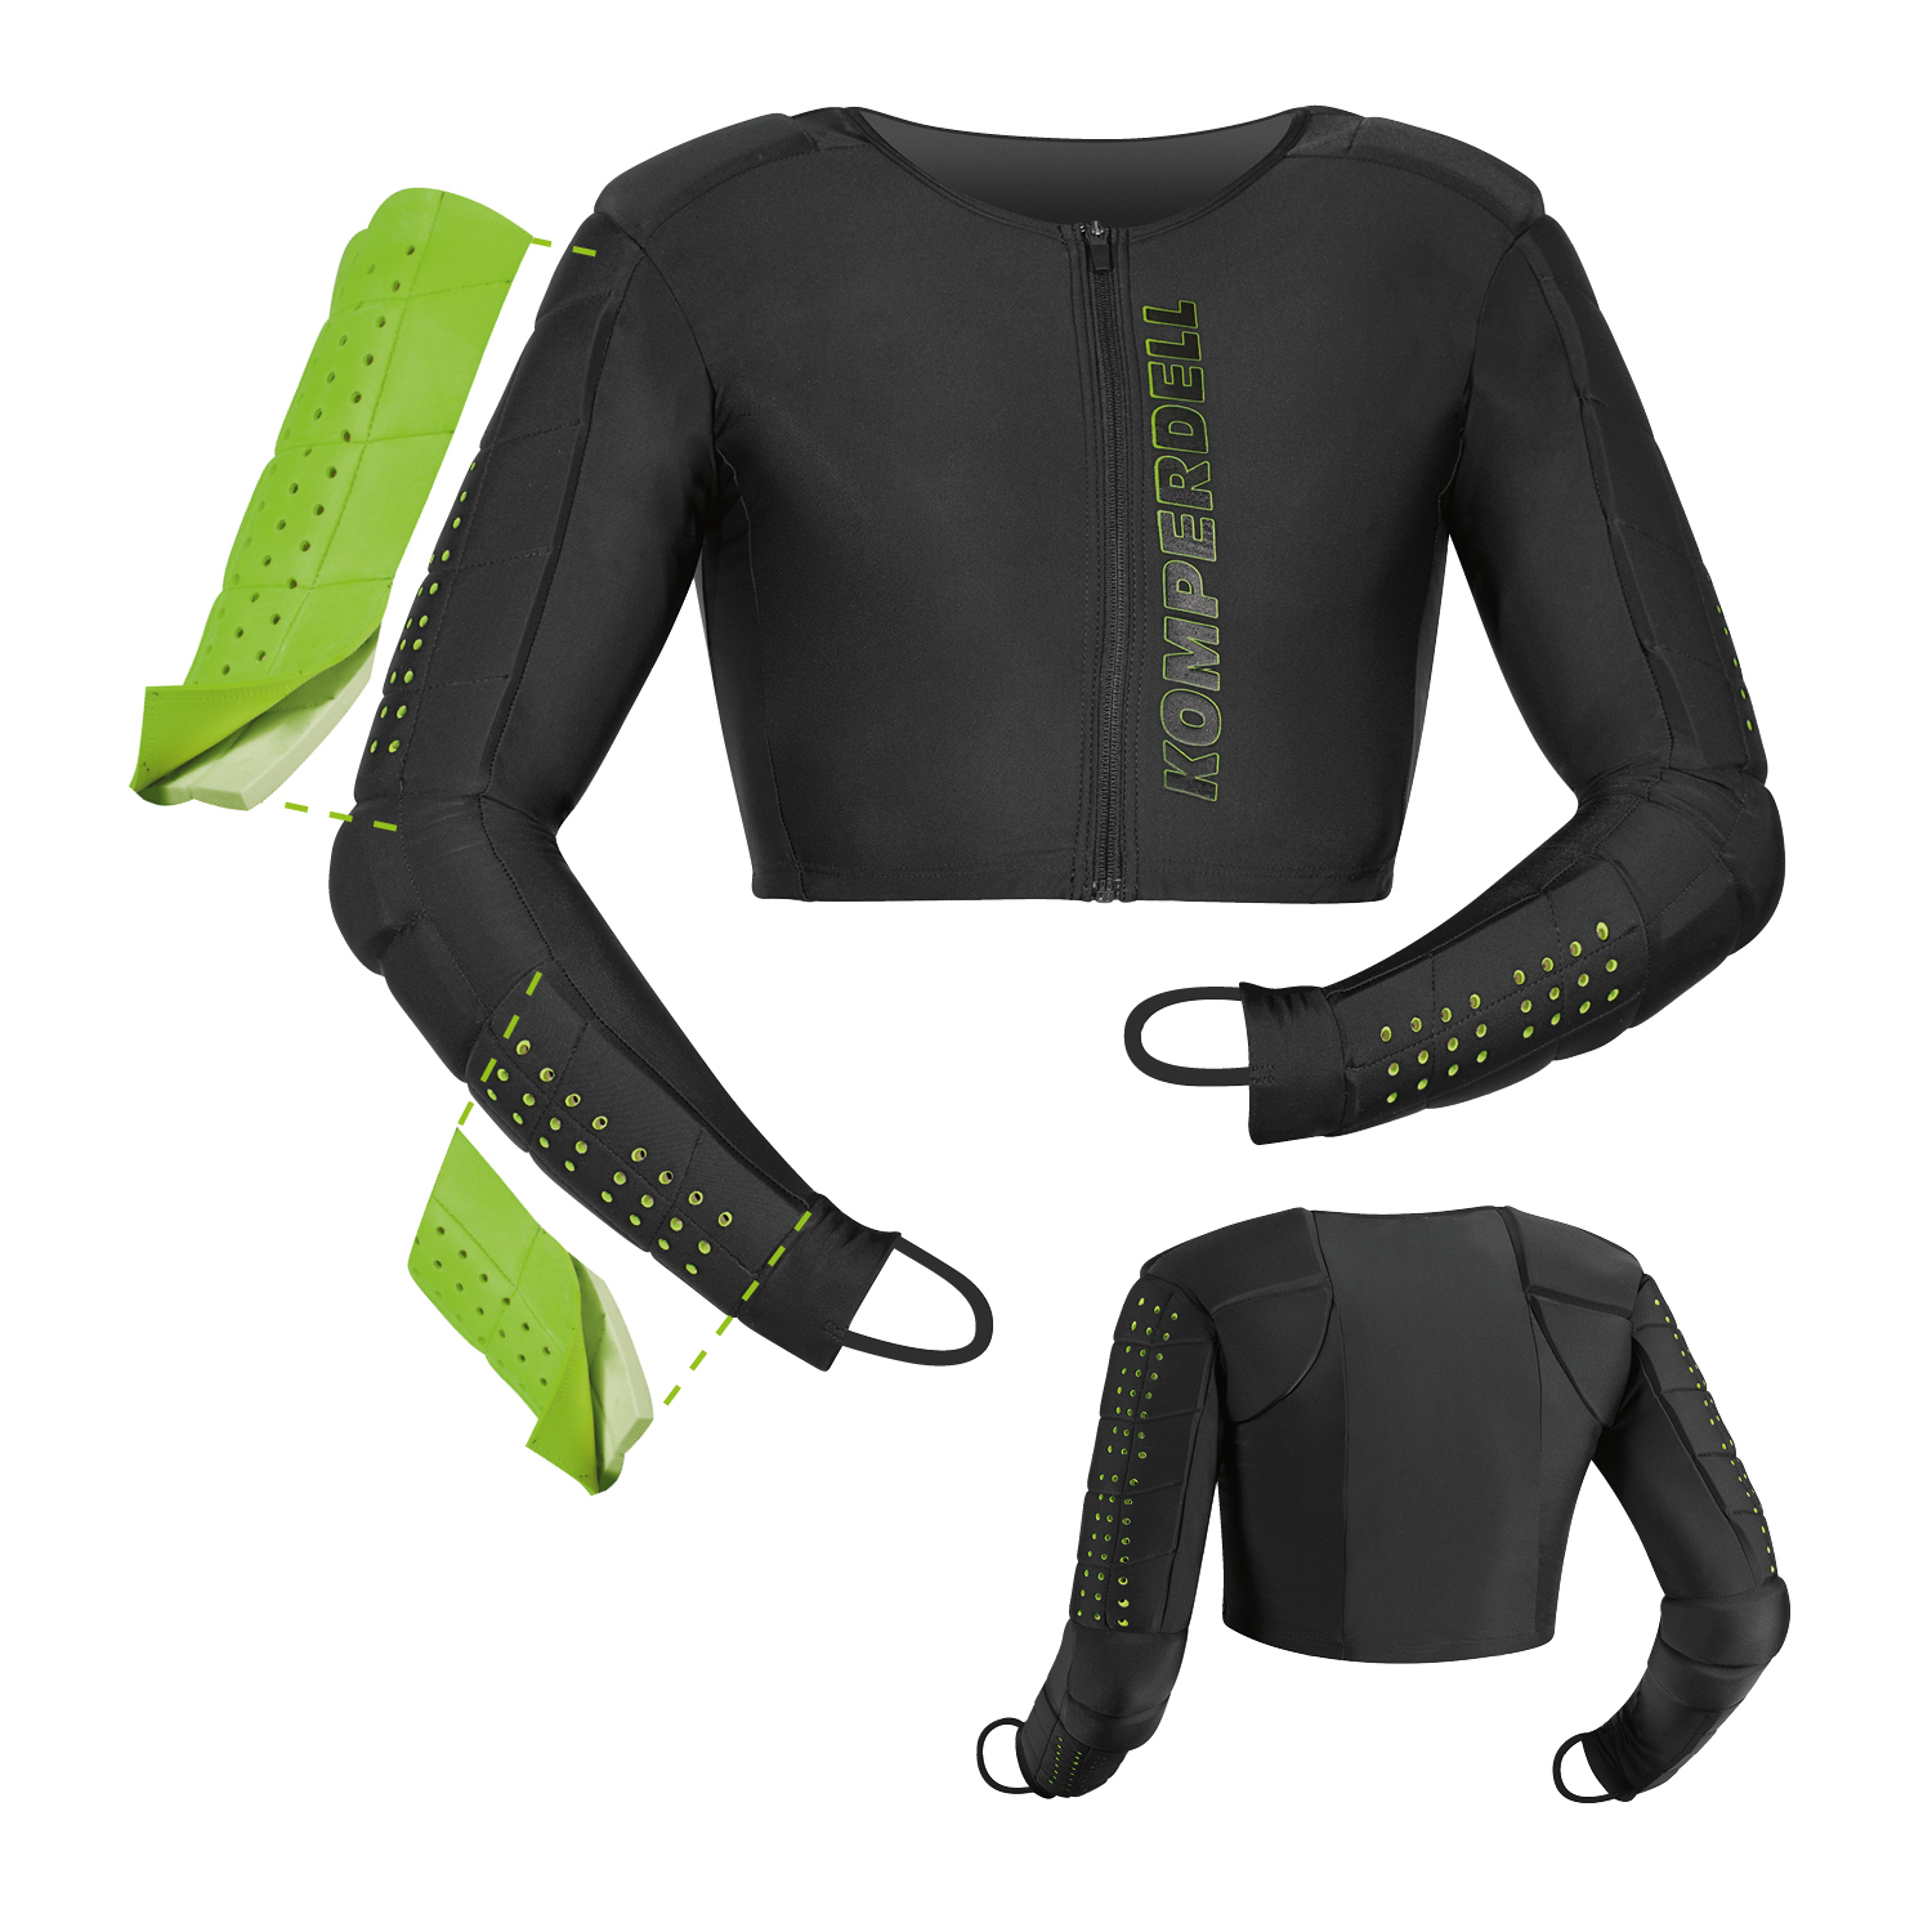 Protector Slalom Shirt Adult